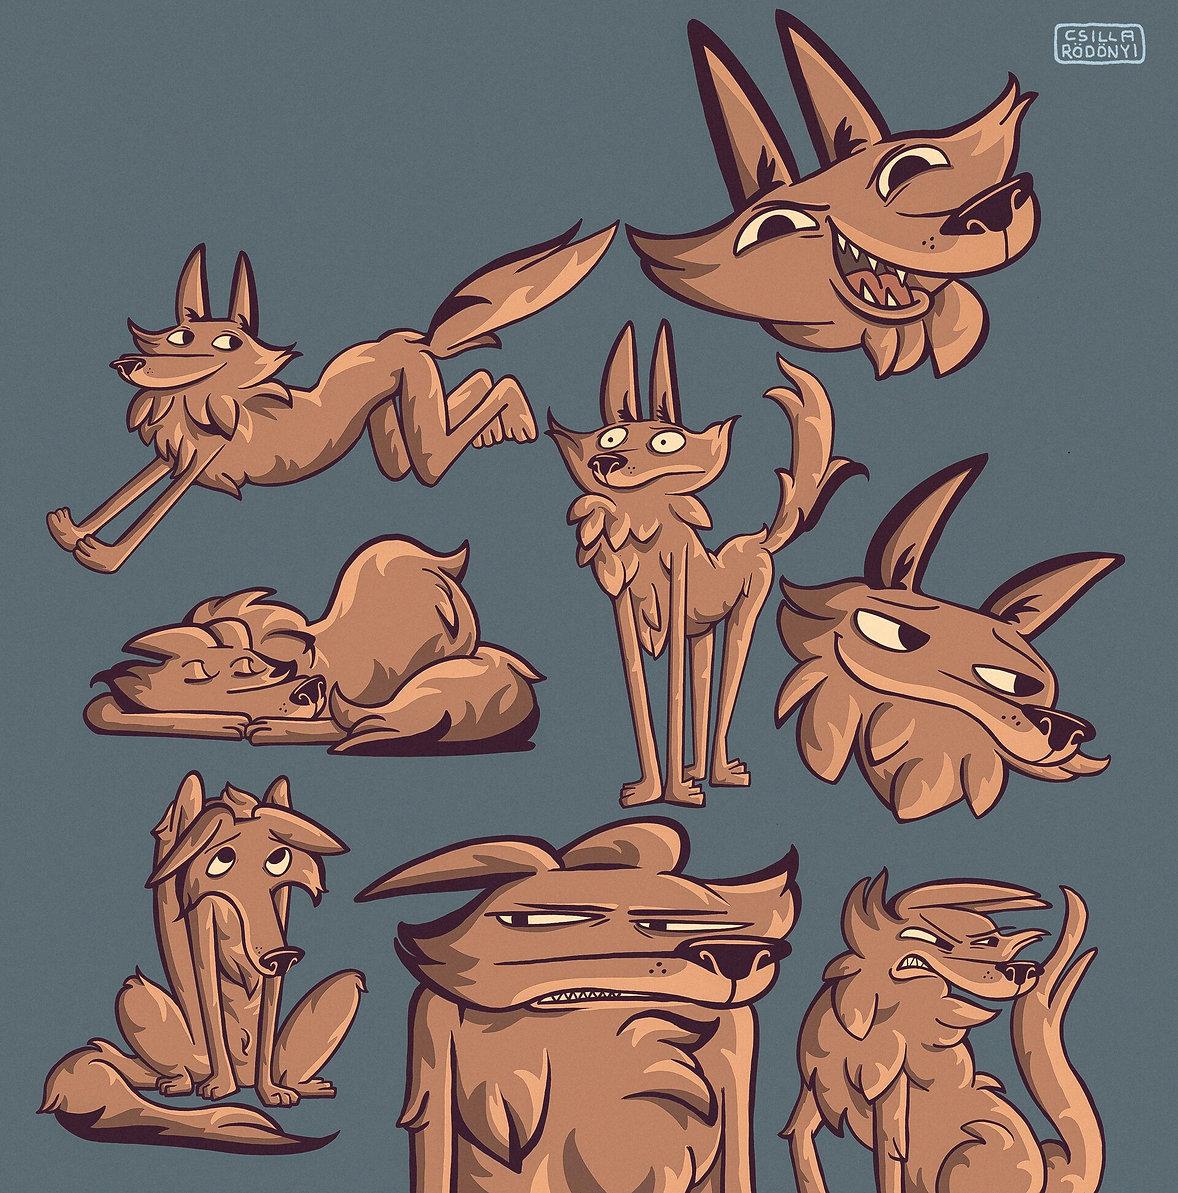 csilla-rodonyi-wolves.jpg